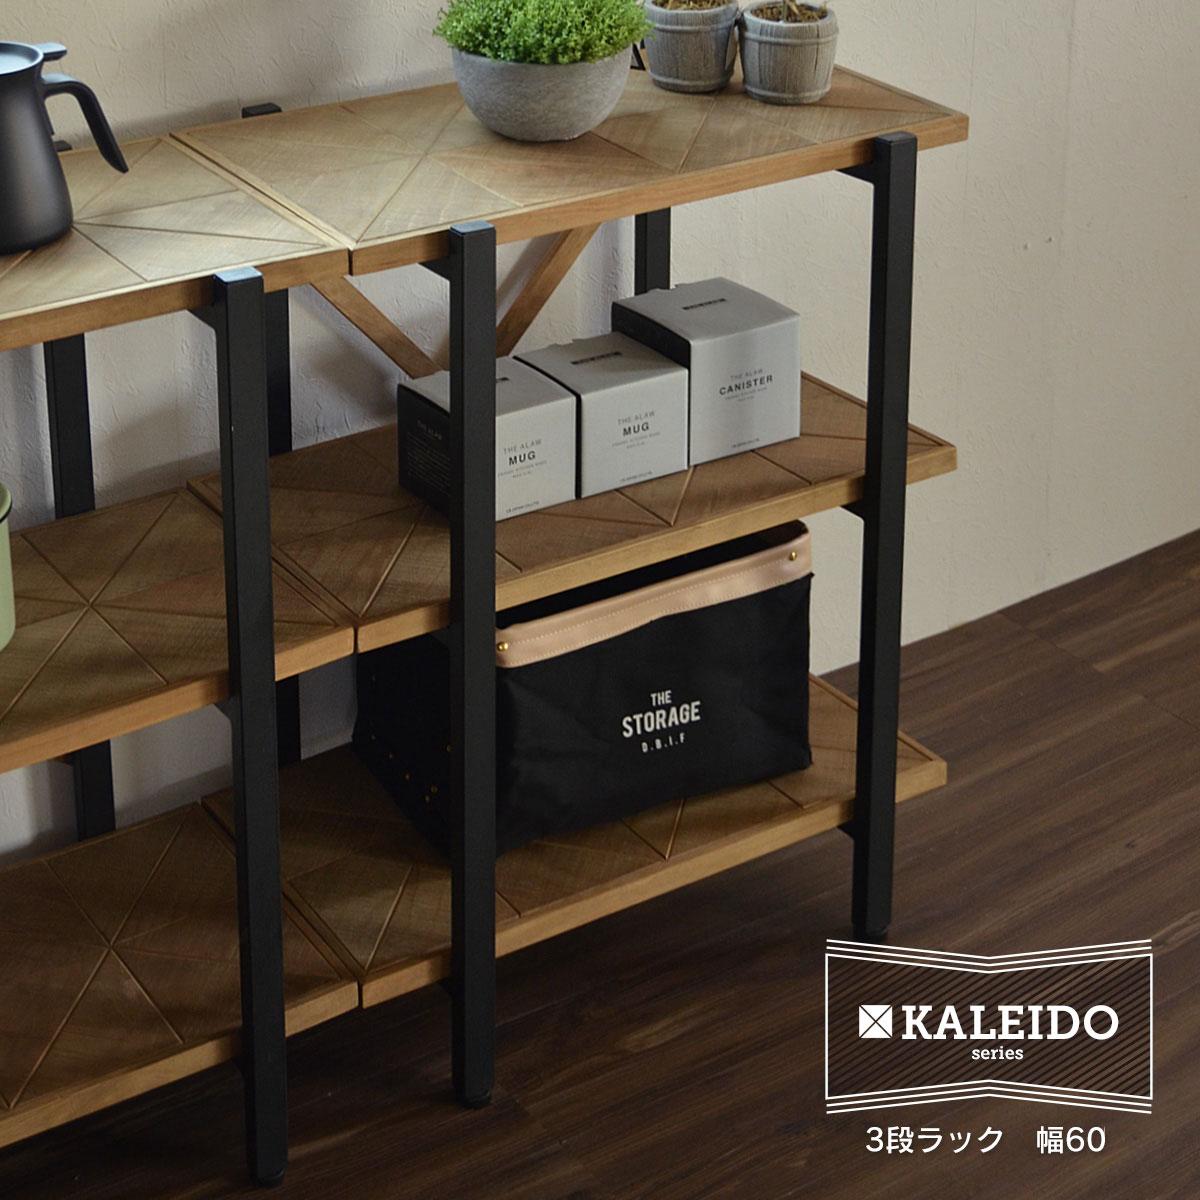 KALEIDO カレイド 3段ラック 幅60cm